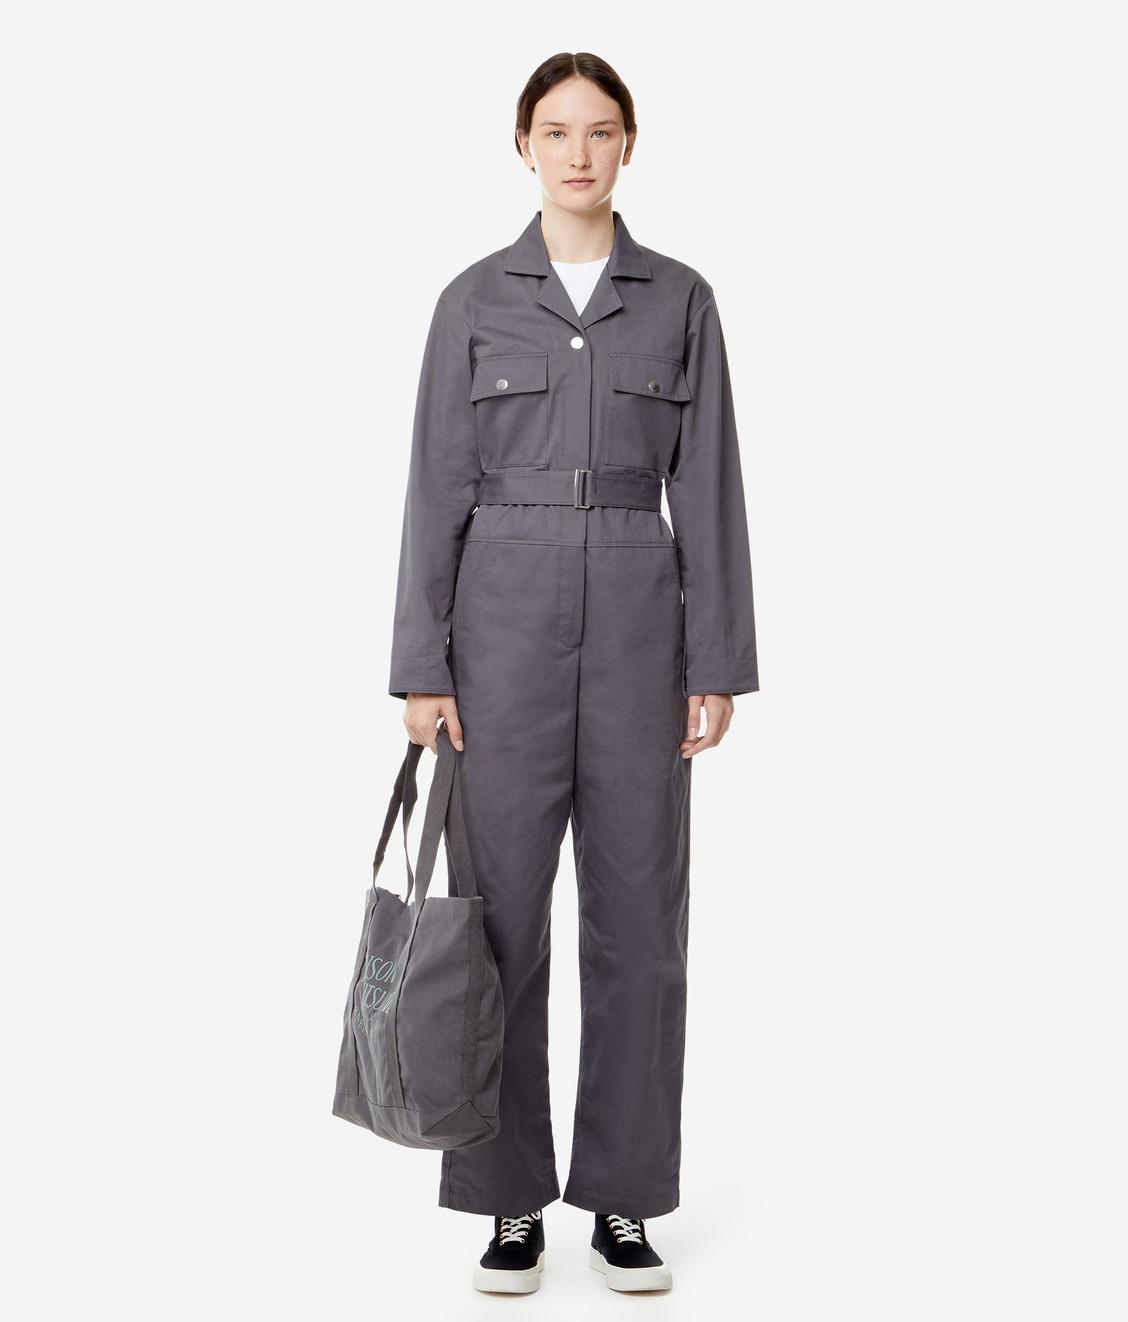 Maison Kitsune Kitsune Worker Jumpsuit Grey